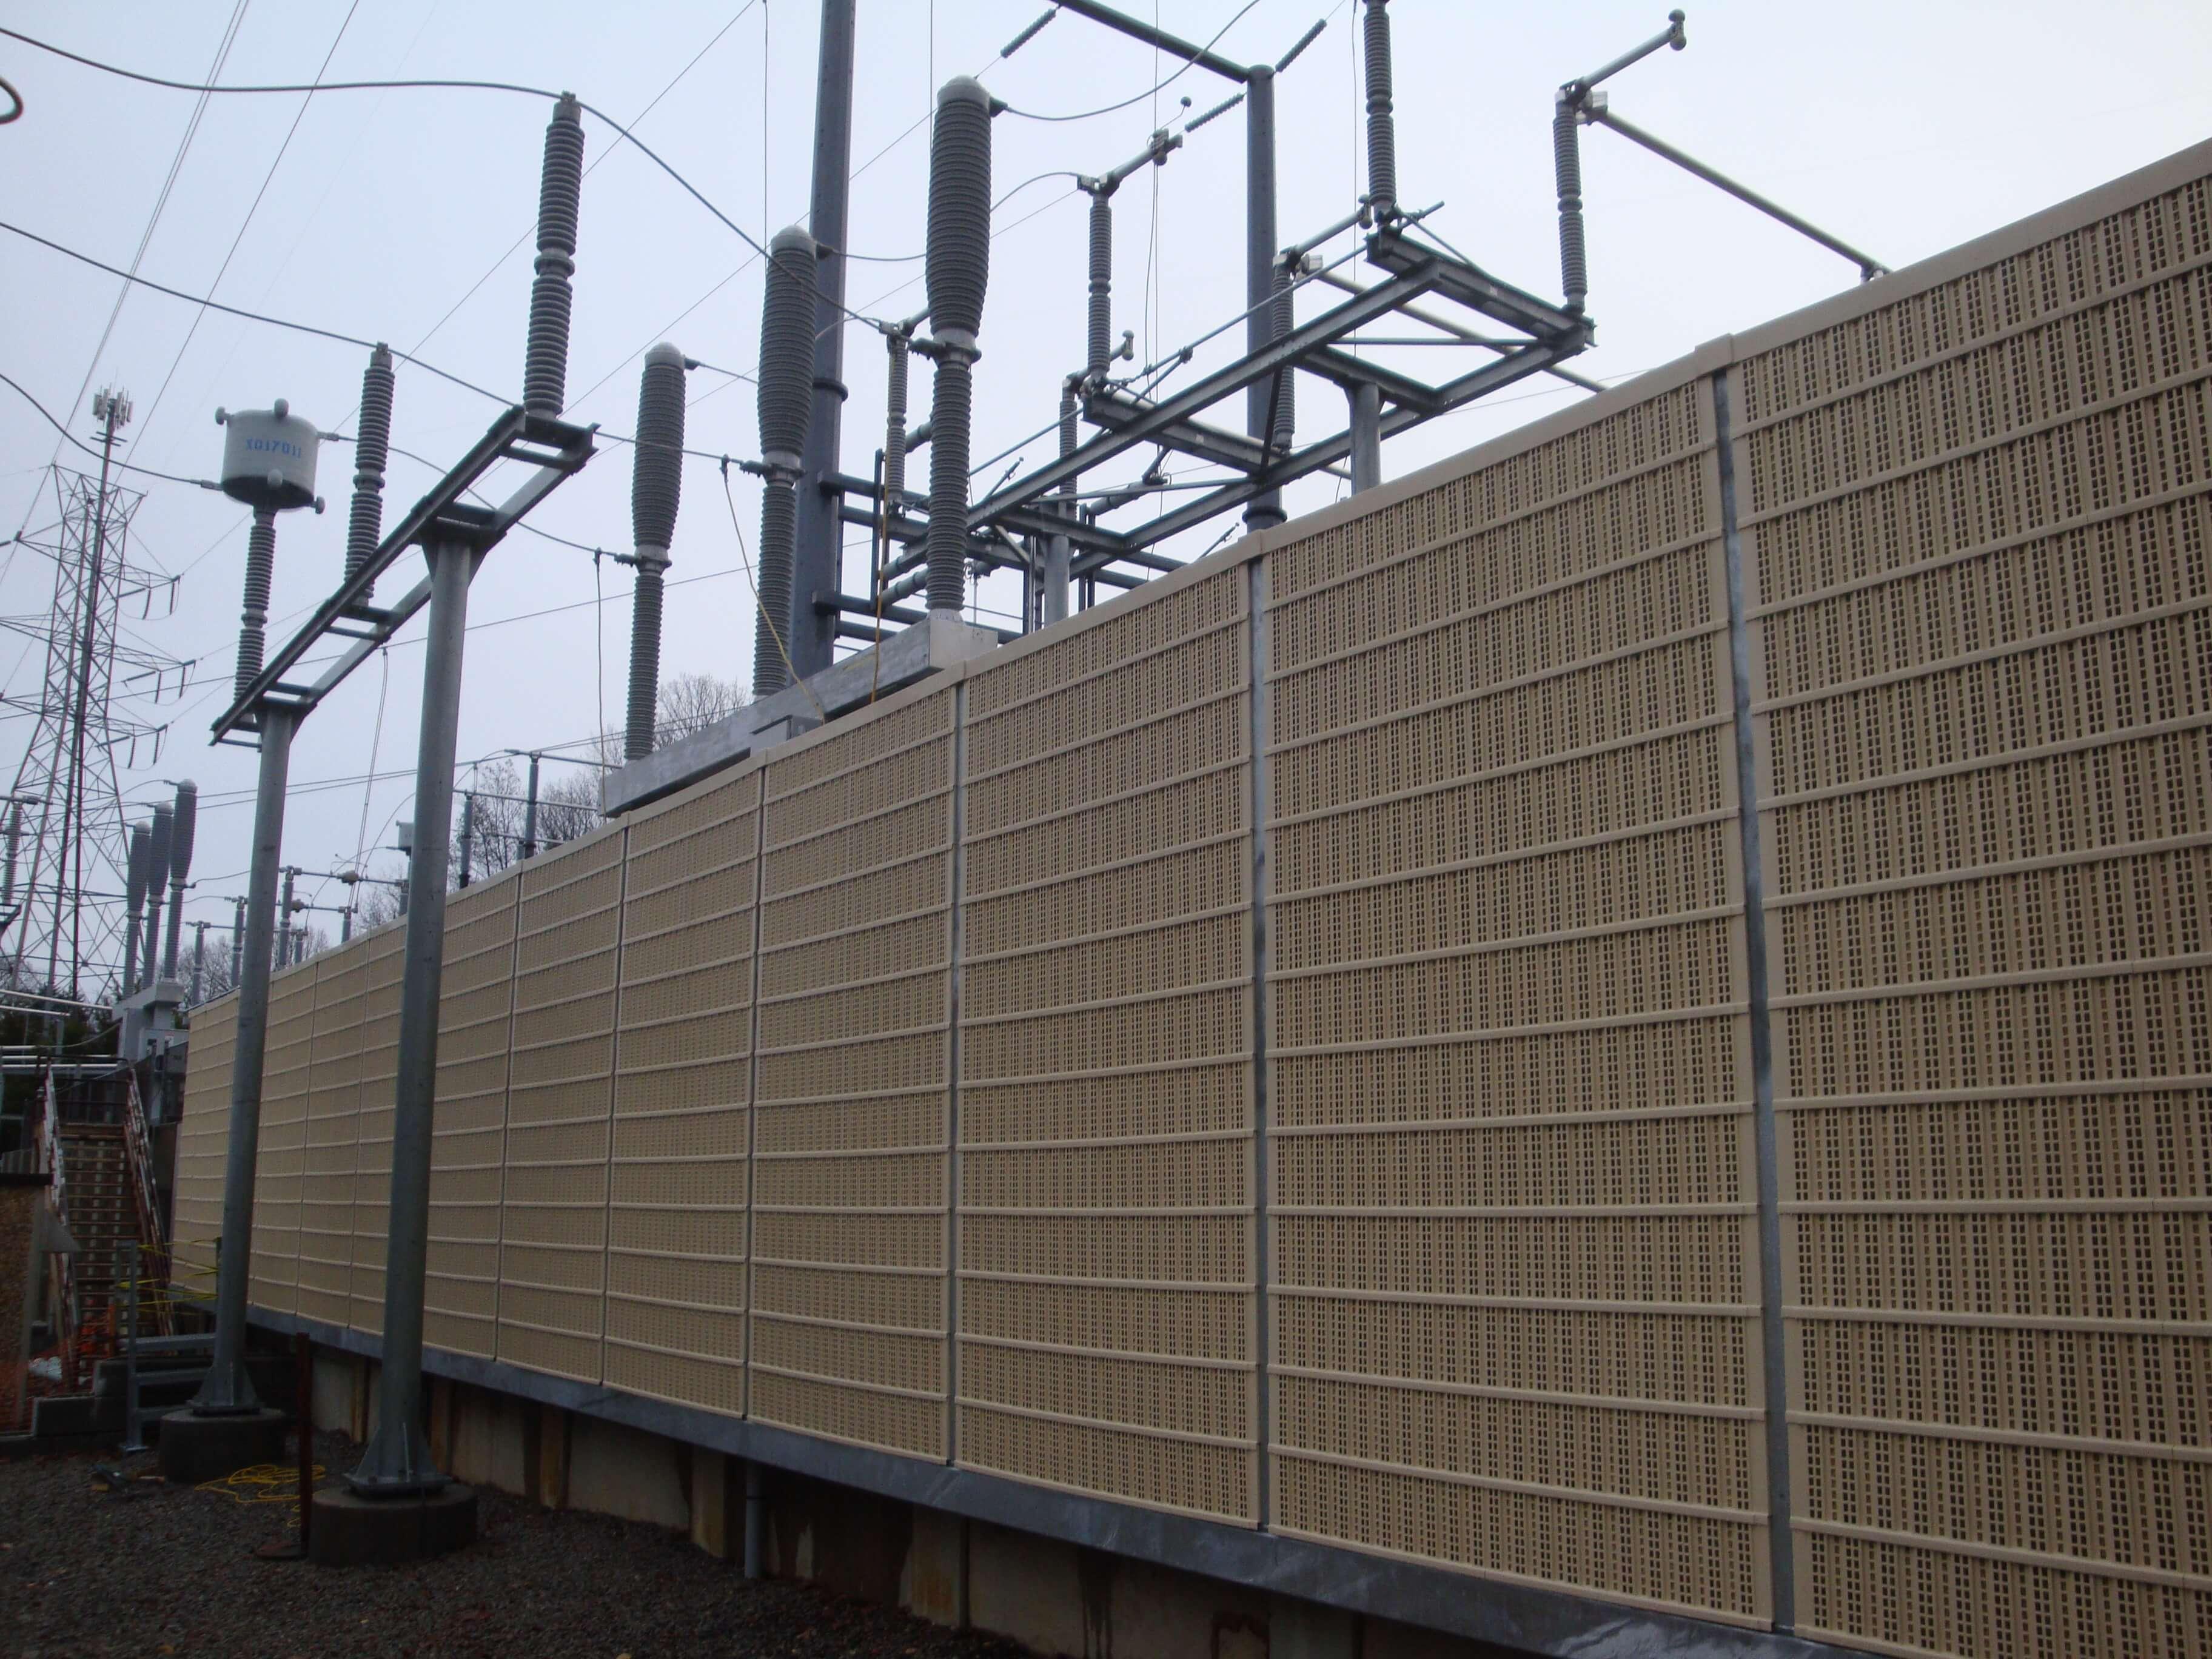 outdoor sound barrier panels outdoor sound wall noise barrier. Black Bedroom Furniture Sets. Home Design Ideas